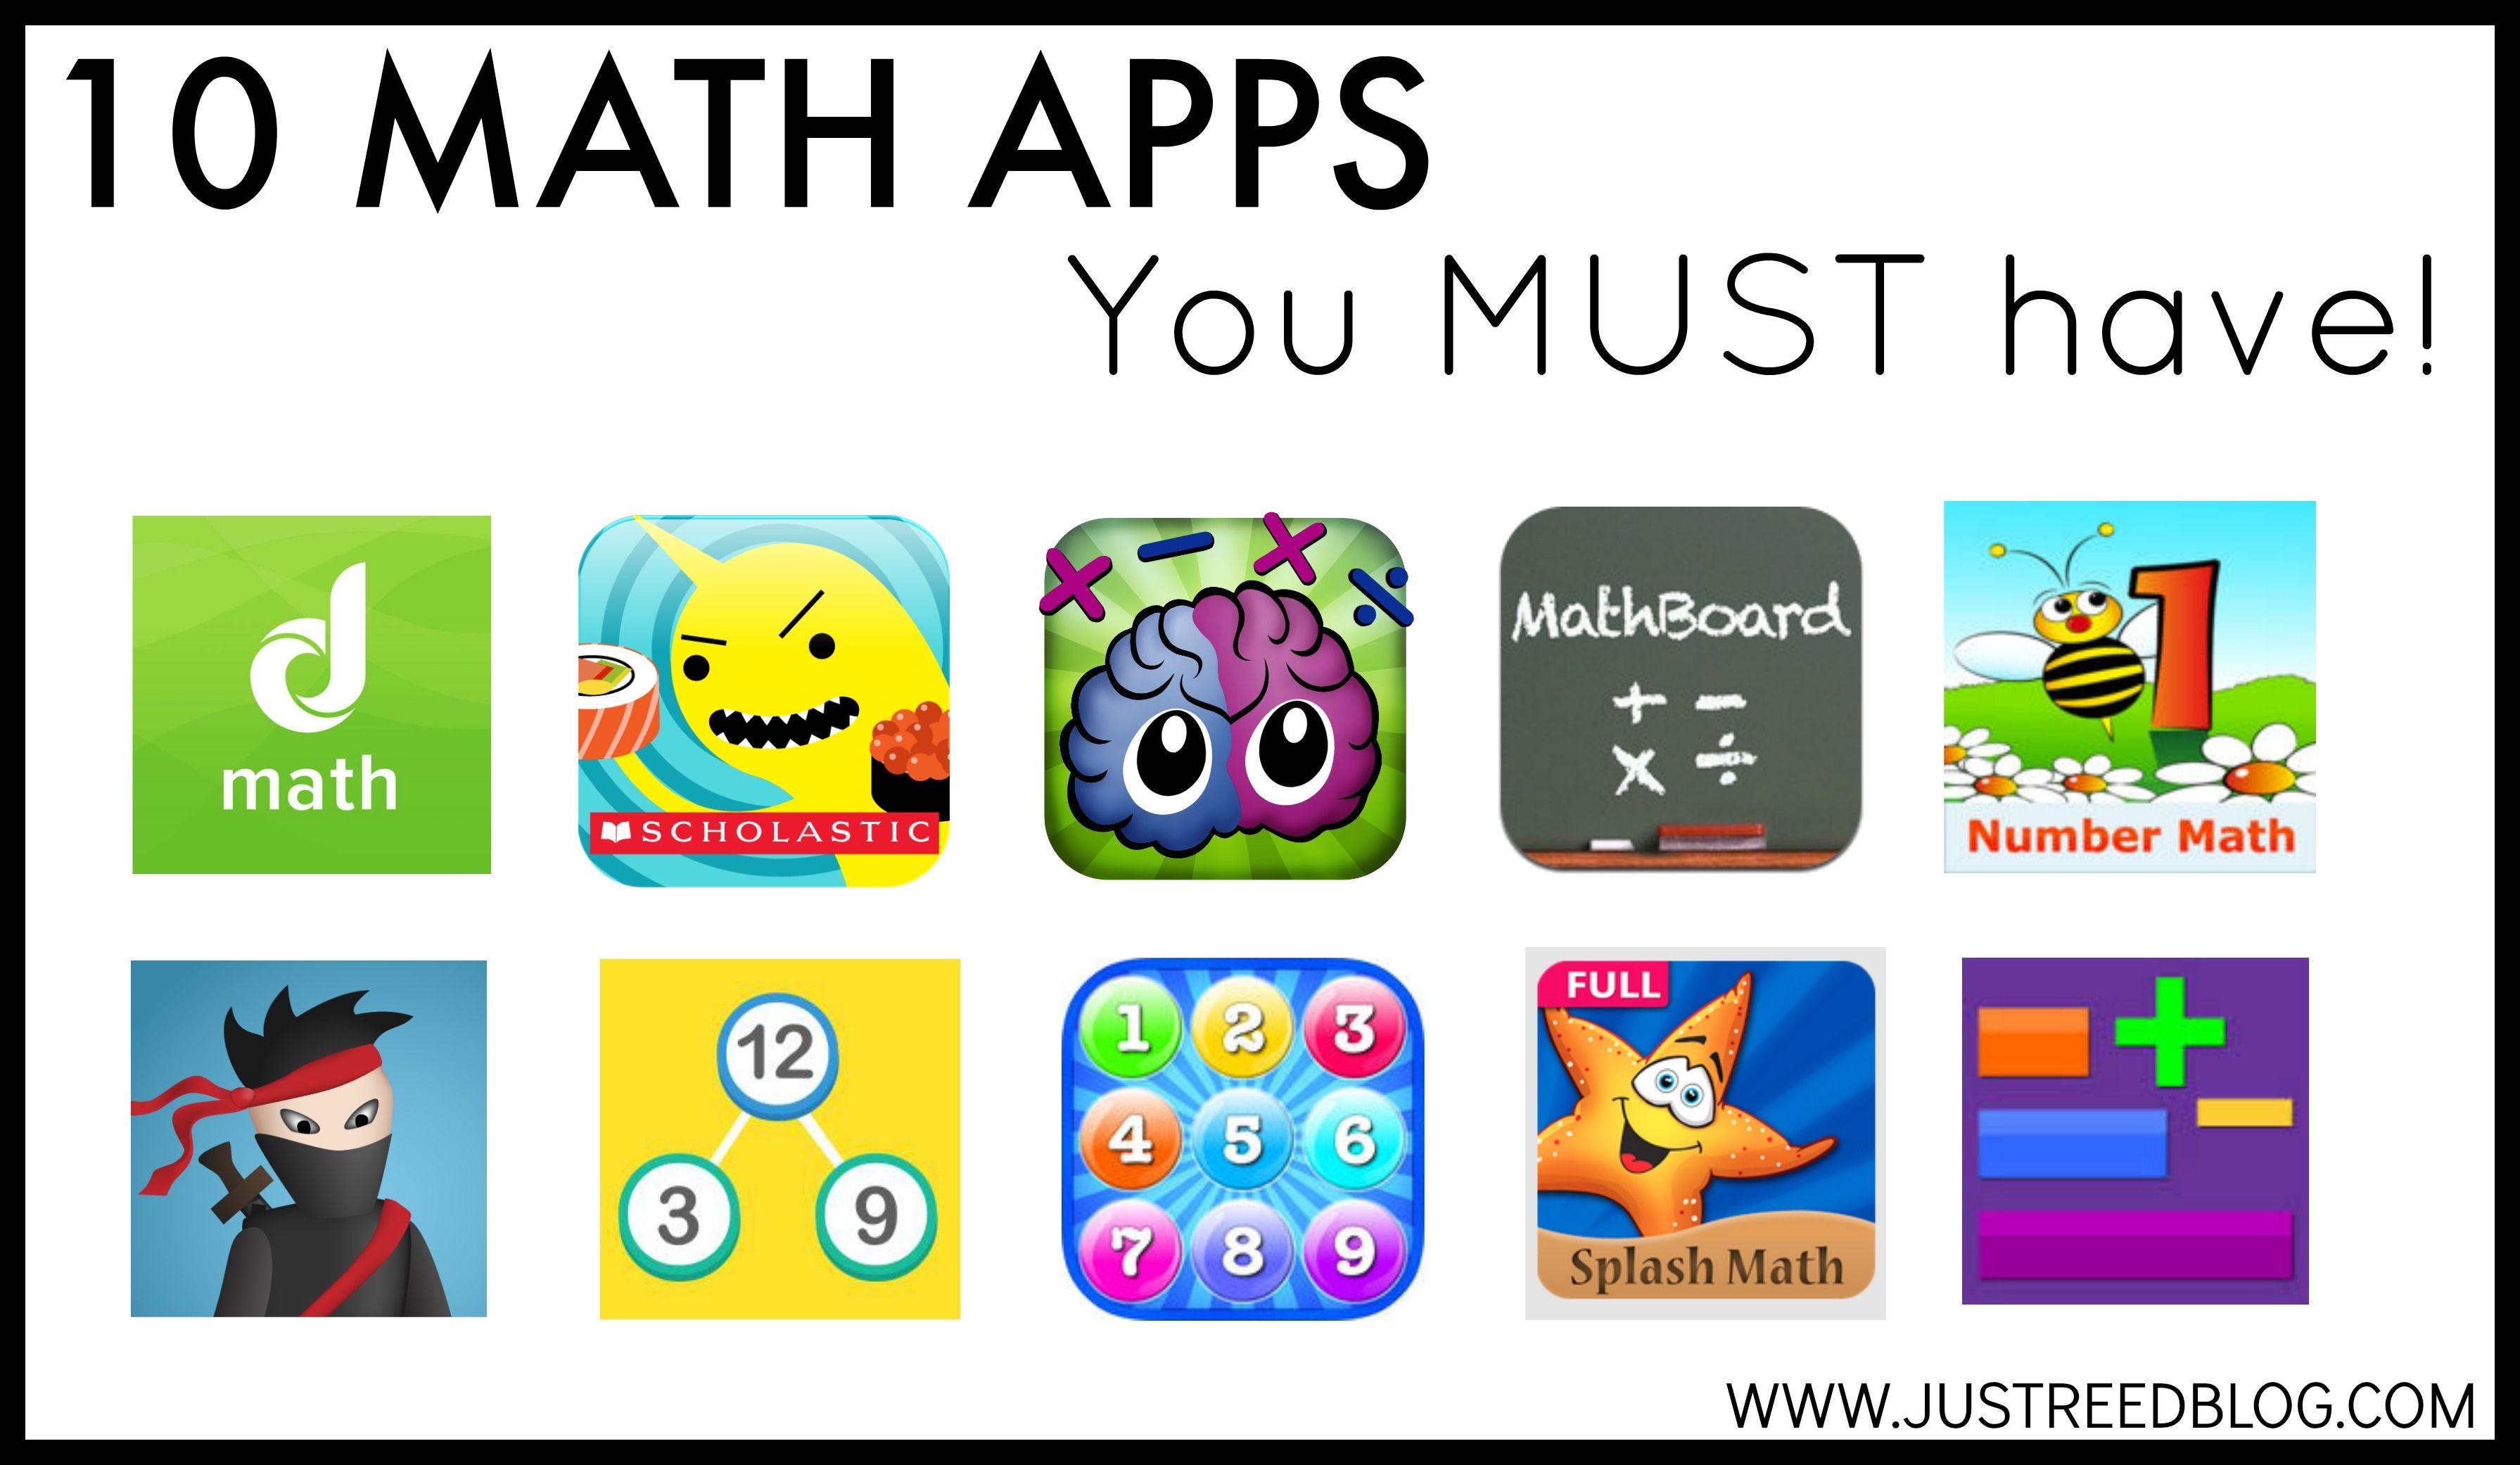 8a72c4df41f33095f5e953823db7e02b - Best Math Apps For Kindergarten